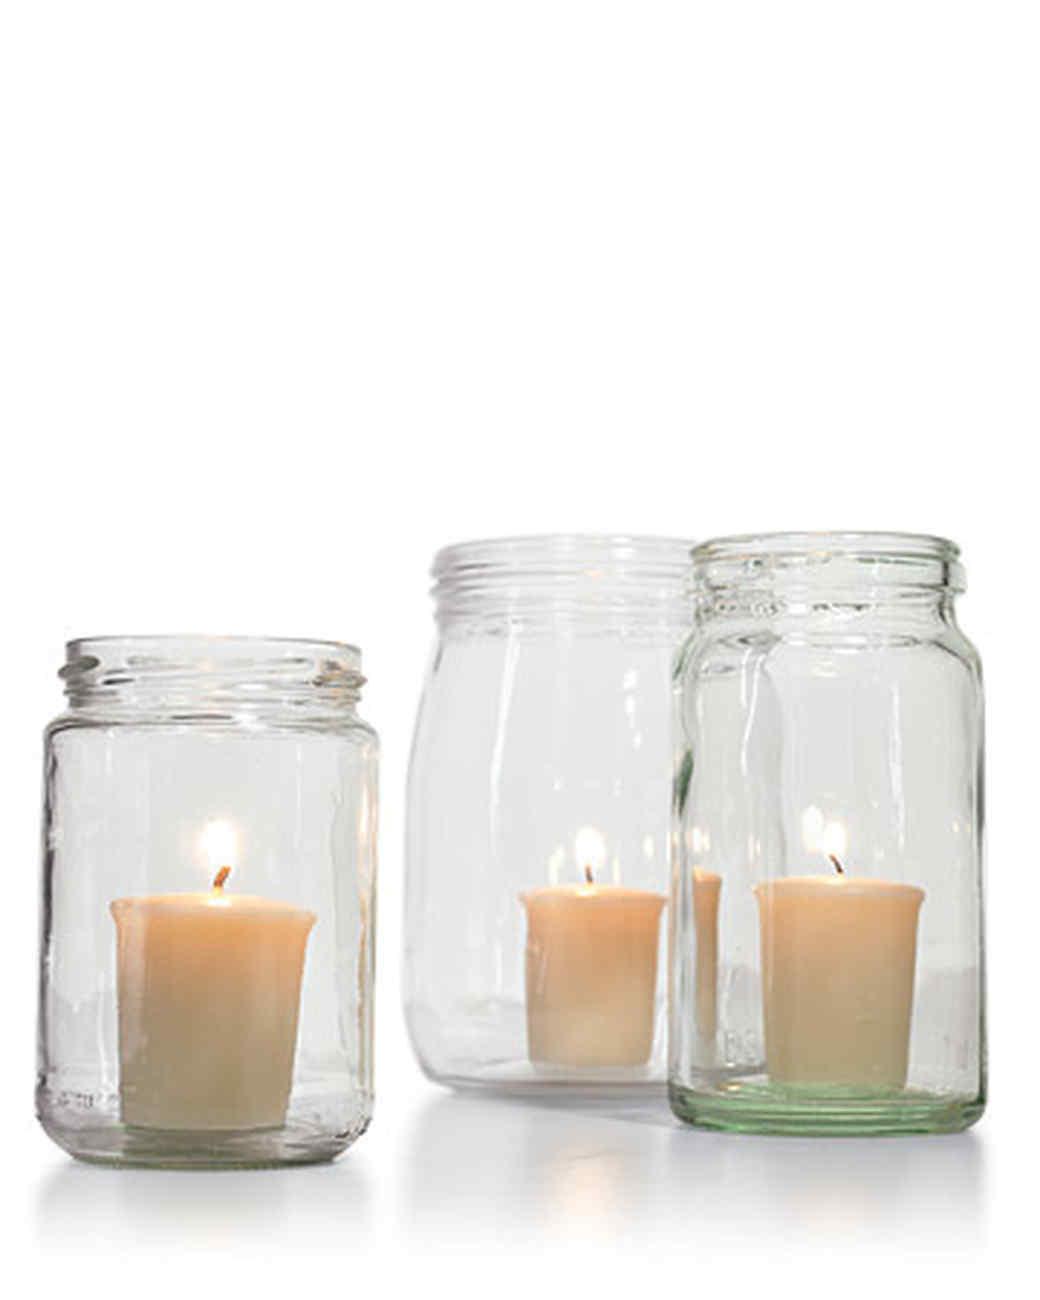 mld103986_0708_candle_jars.jpg